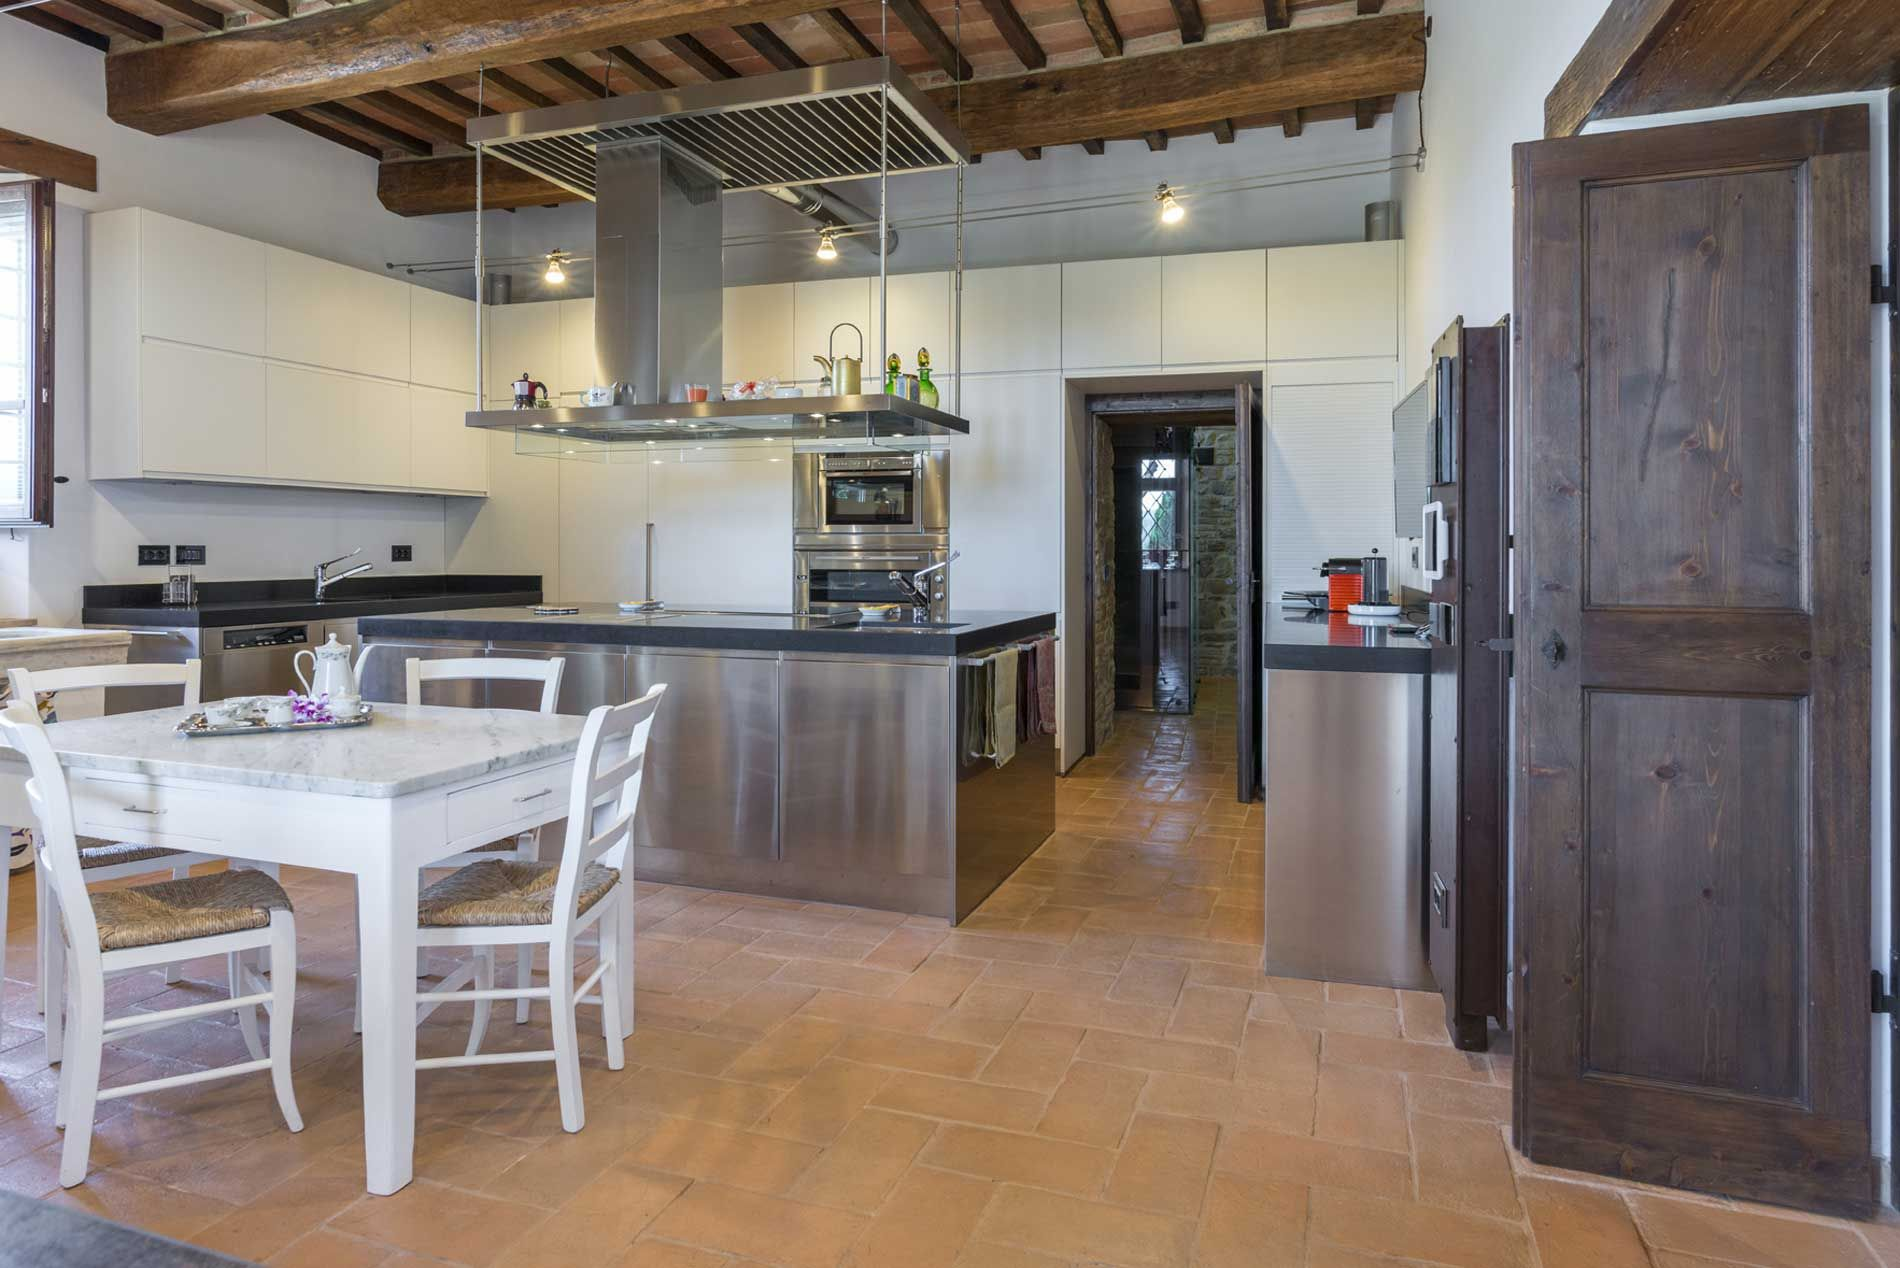 #interiordesign #home #cottofattoamano #madeinitaly #handmade #fornace #arredamento #homedesign